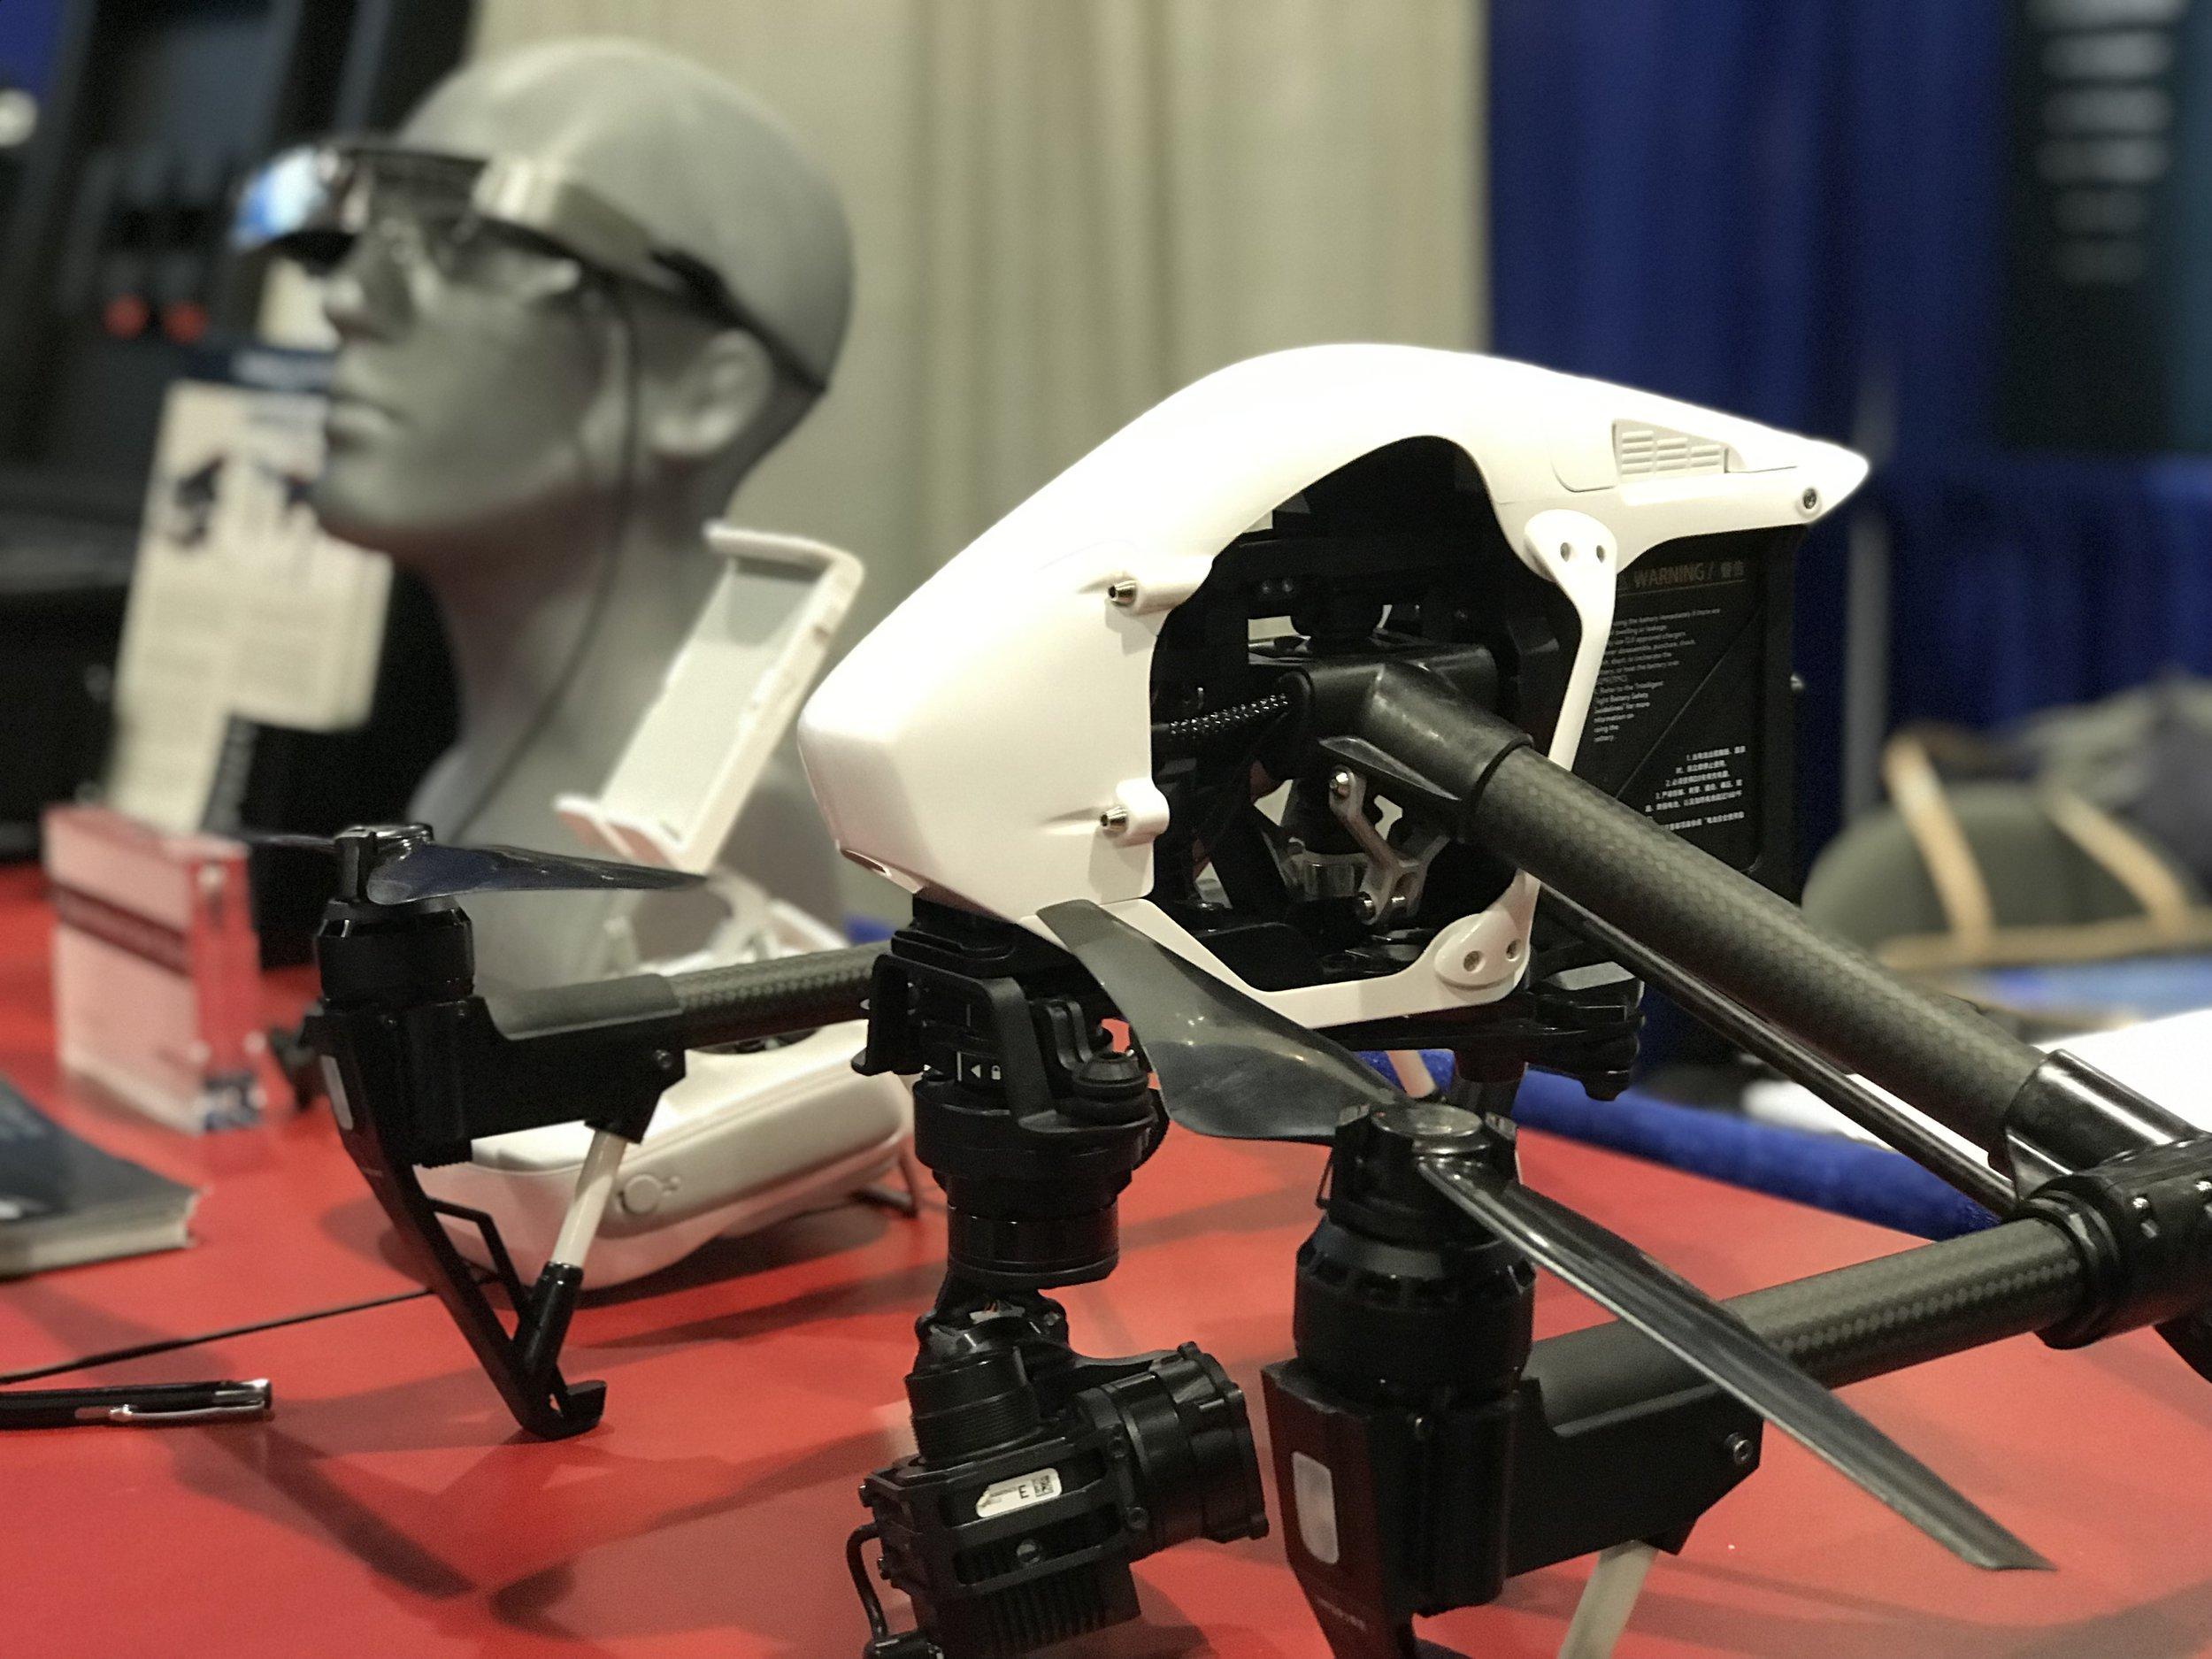 IPOZ_LAB+Houston Energy Drone and Robotics Summit.JPG